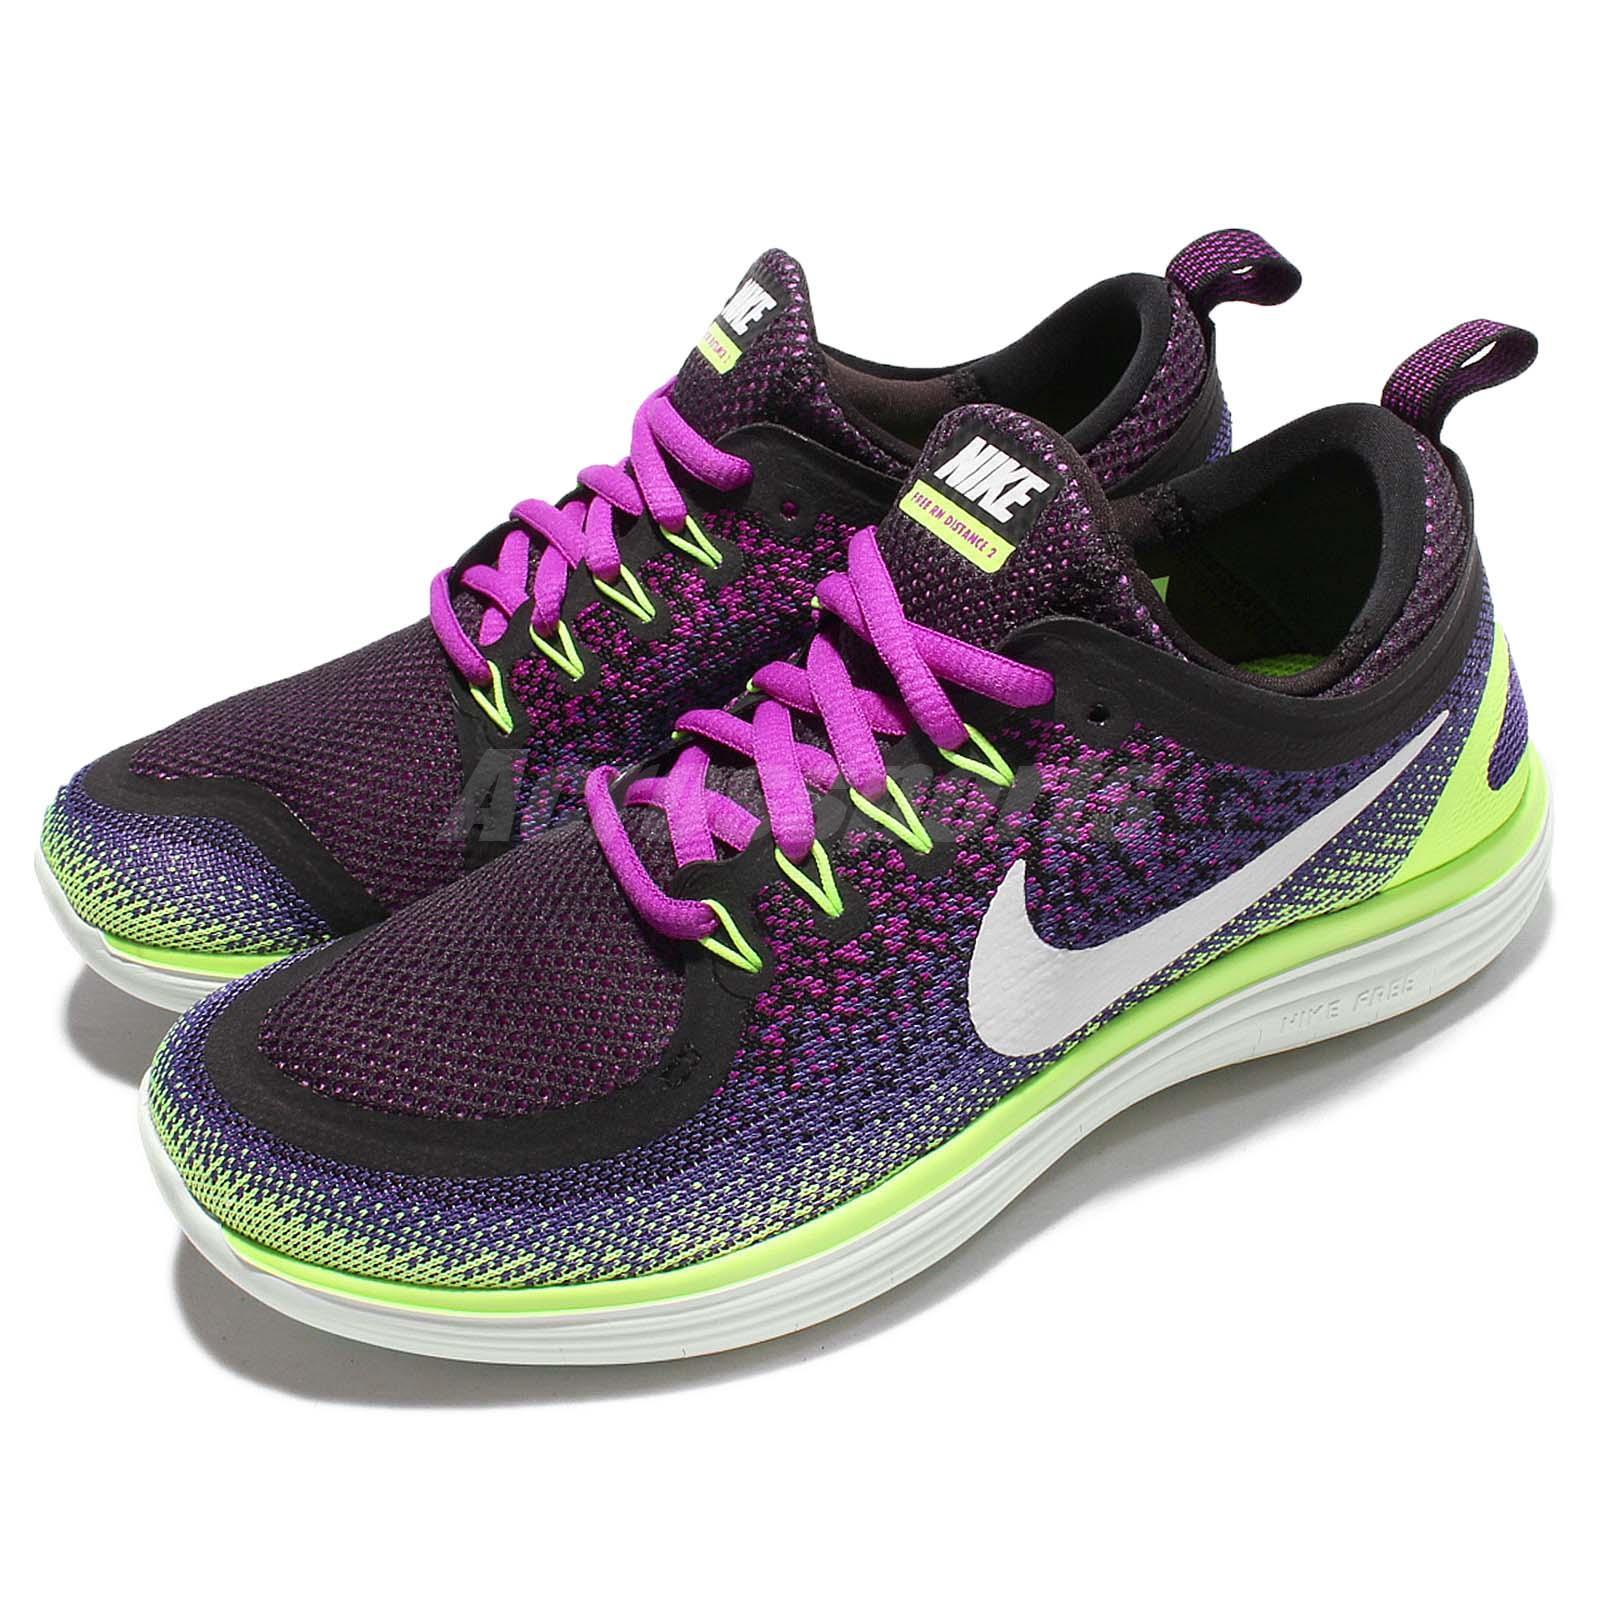 Wmns Nike Free RN Distance 2 II Run Purple Green Women ...